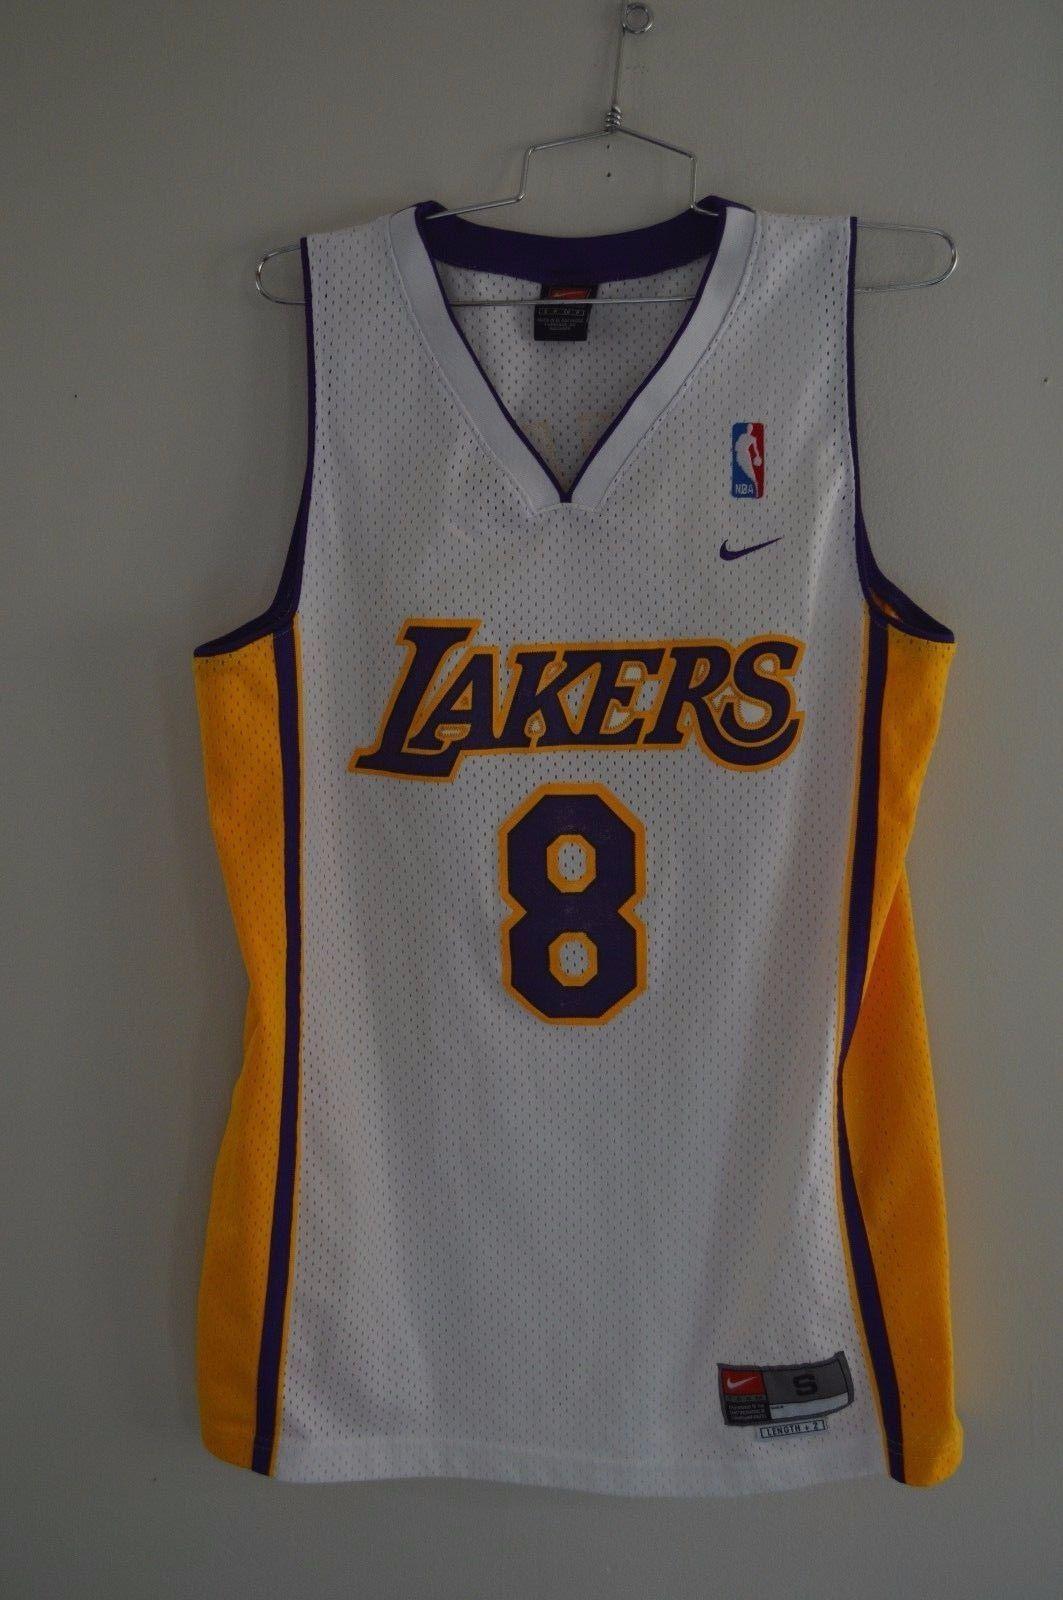 da0bb23eea3 RARE Vintage Nike Los Angeles Lakers Kobe Bryant 8 Home White Jersey Mens S  VTG please